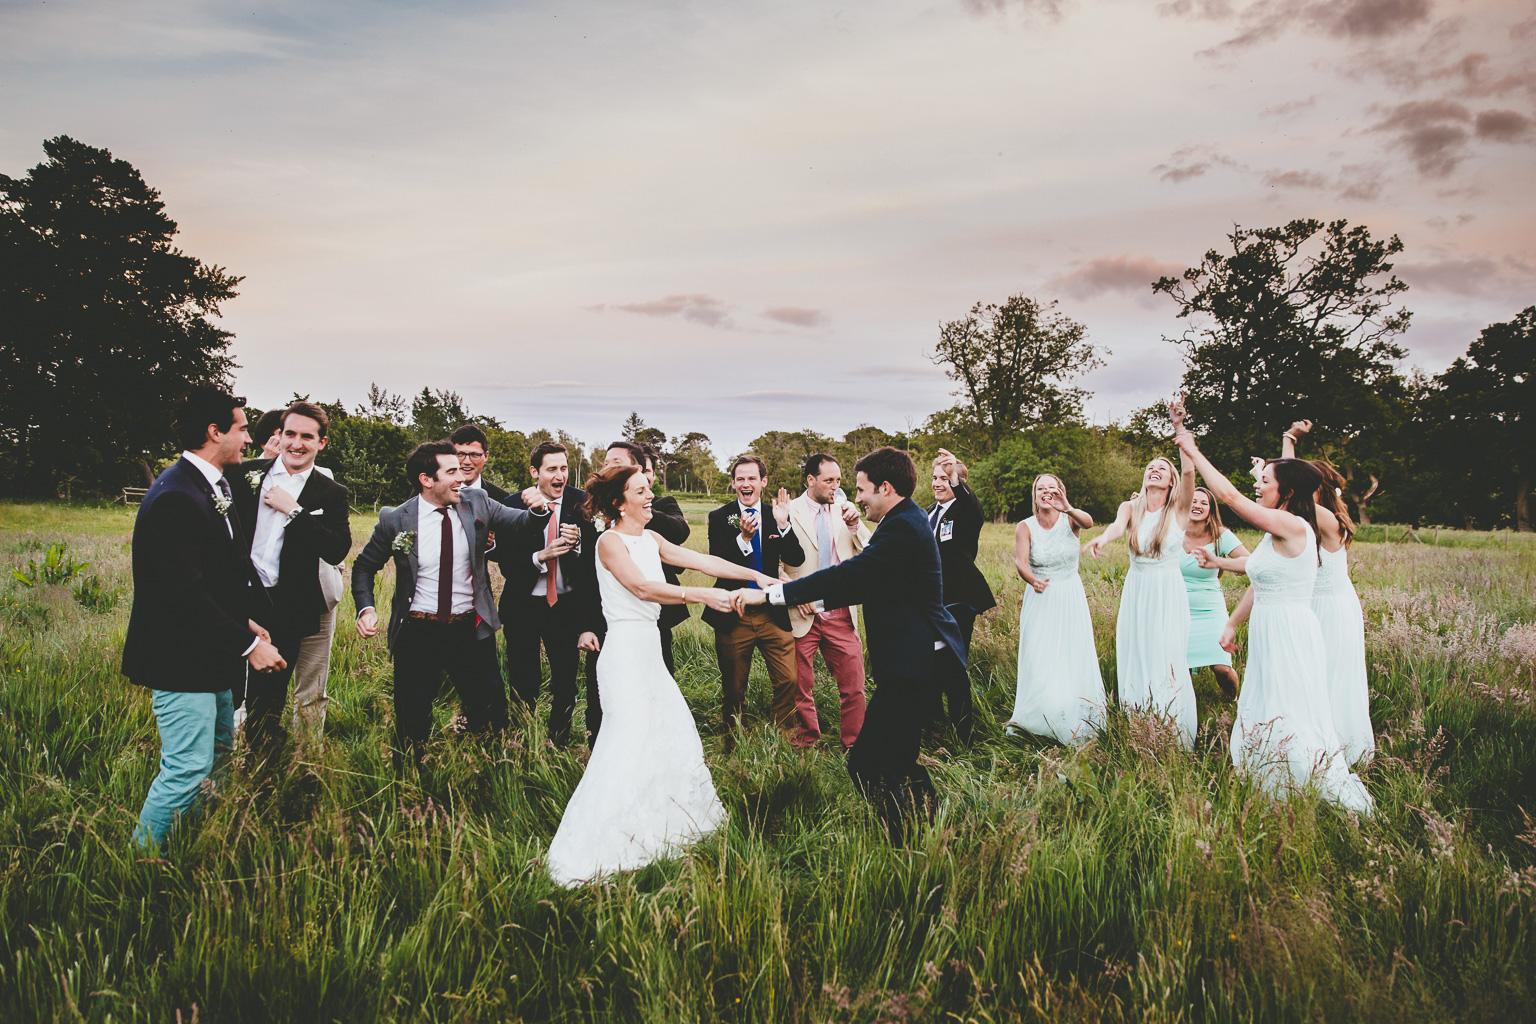 Best-wedding-photography-00010